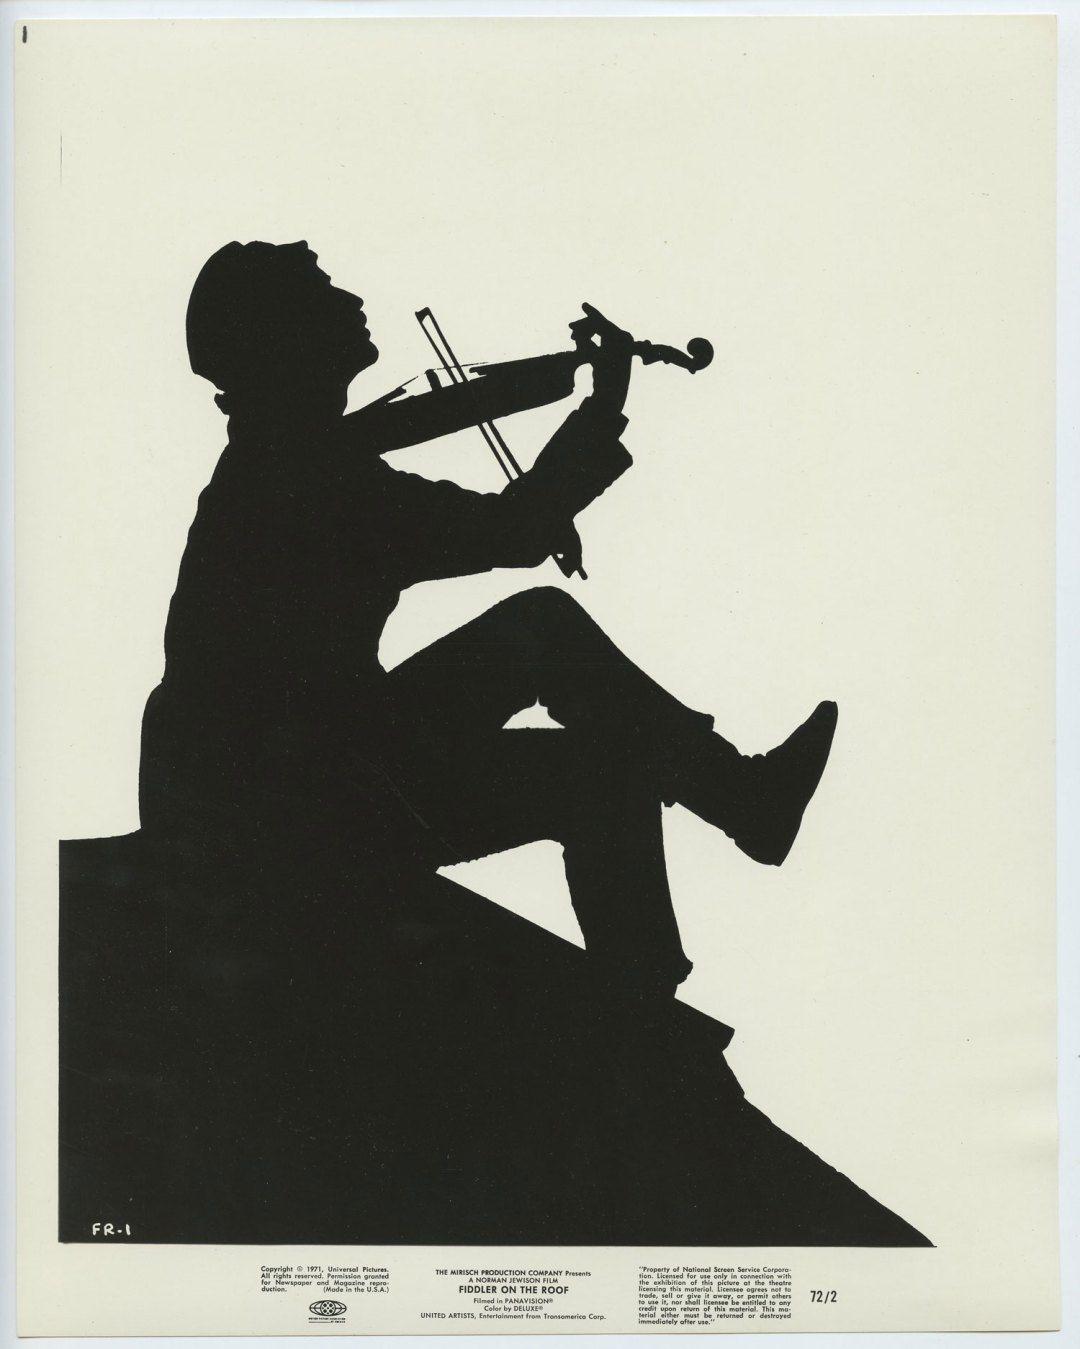 Topol Photo 1971 Fiddler on the Roof in 2020 Fiddler on